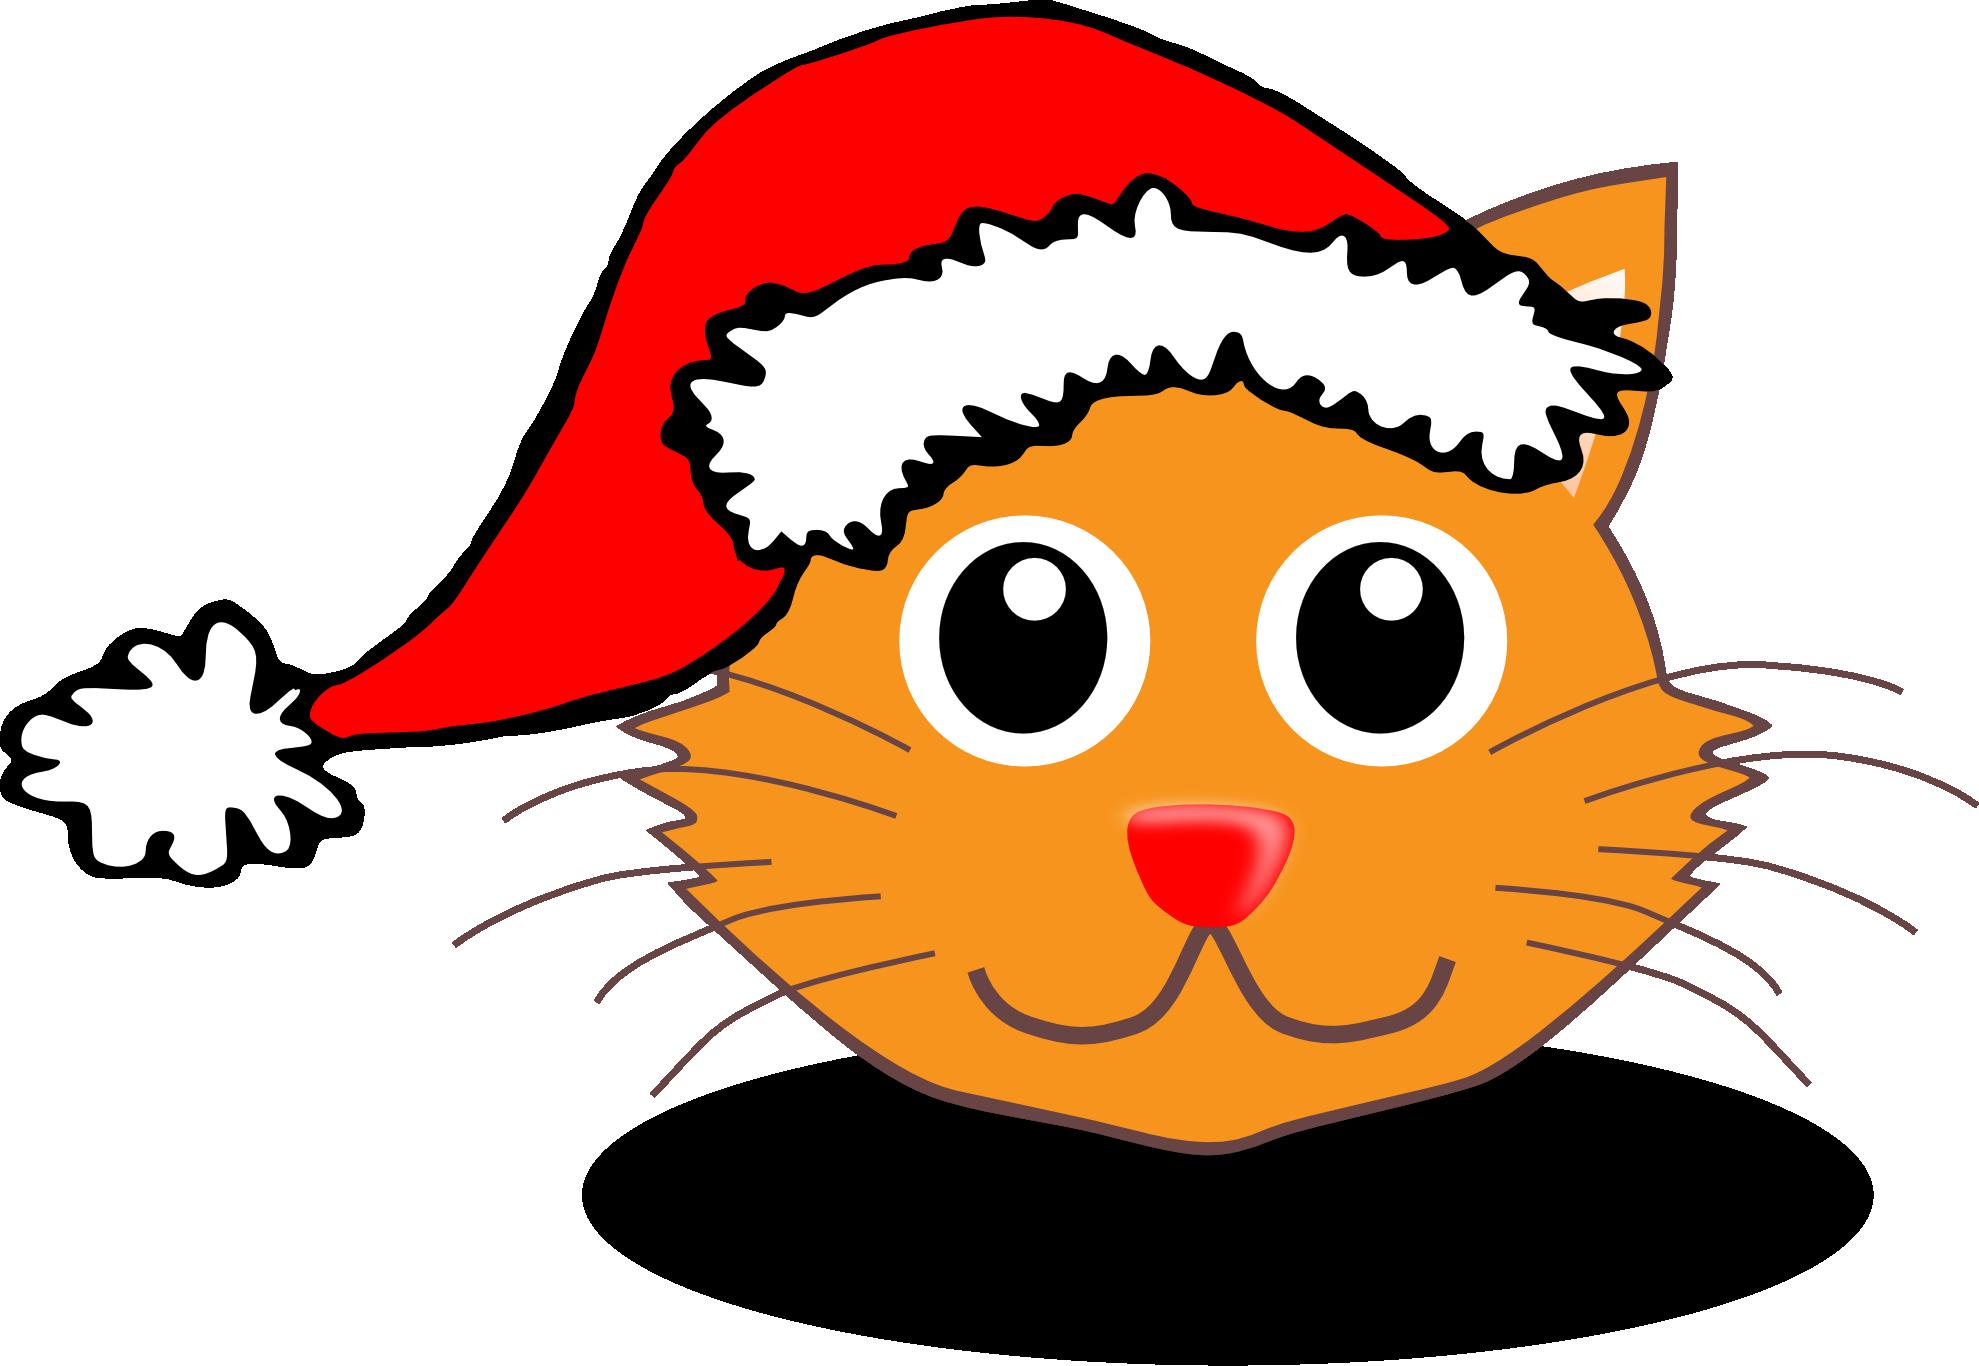 Santa clipart sleeping. Free cartoon christmas download